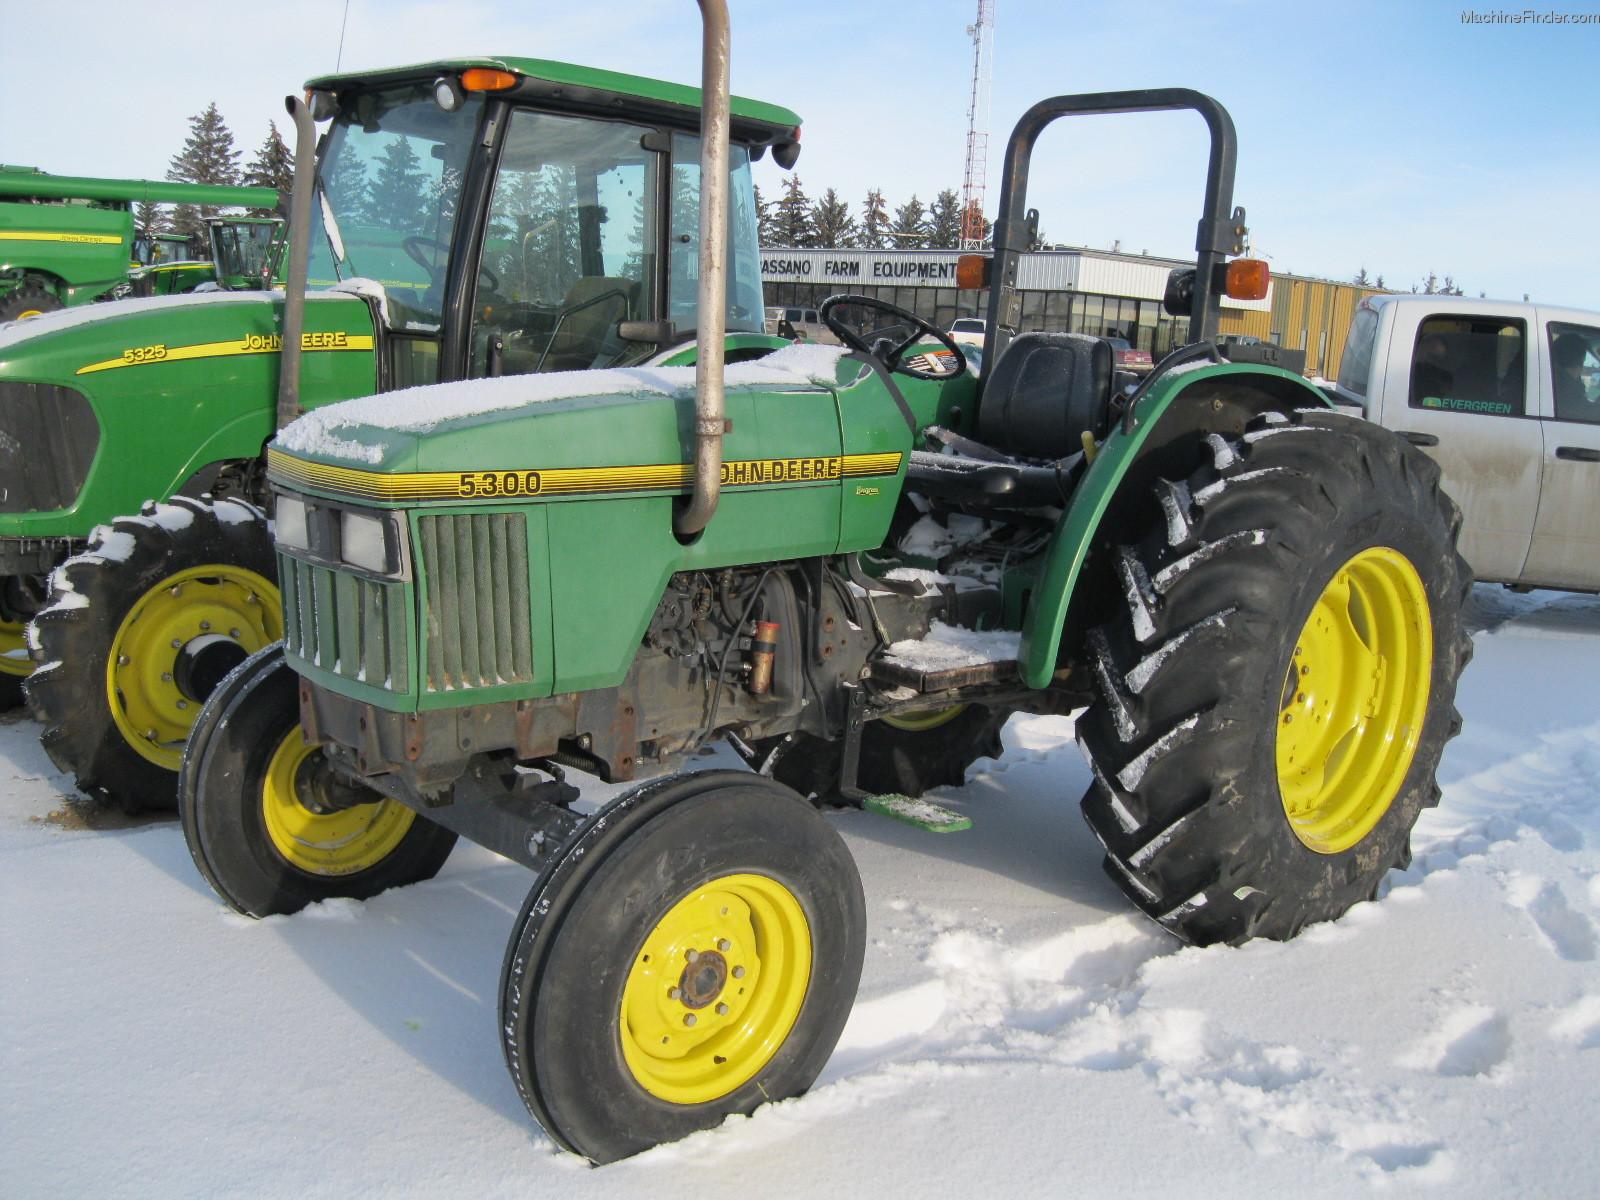 1996 John Deere 5300 Tractors - Utility (40-100hp) - John ...